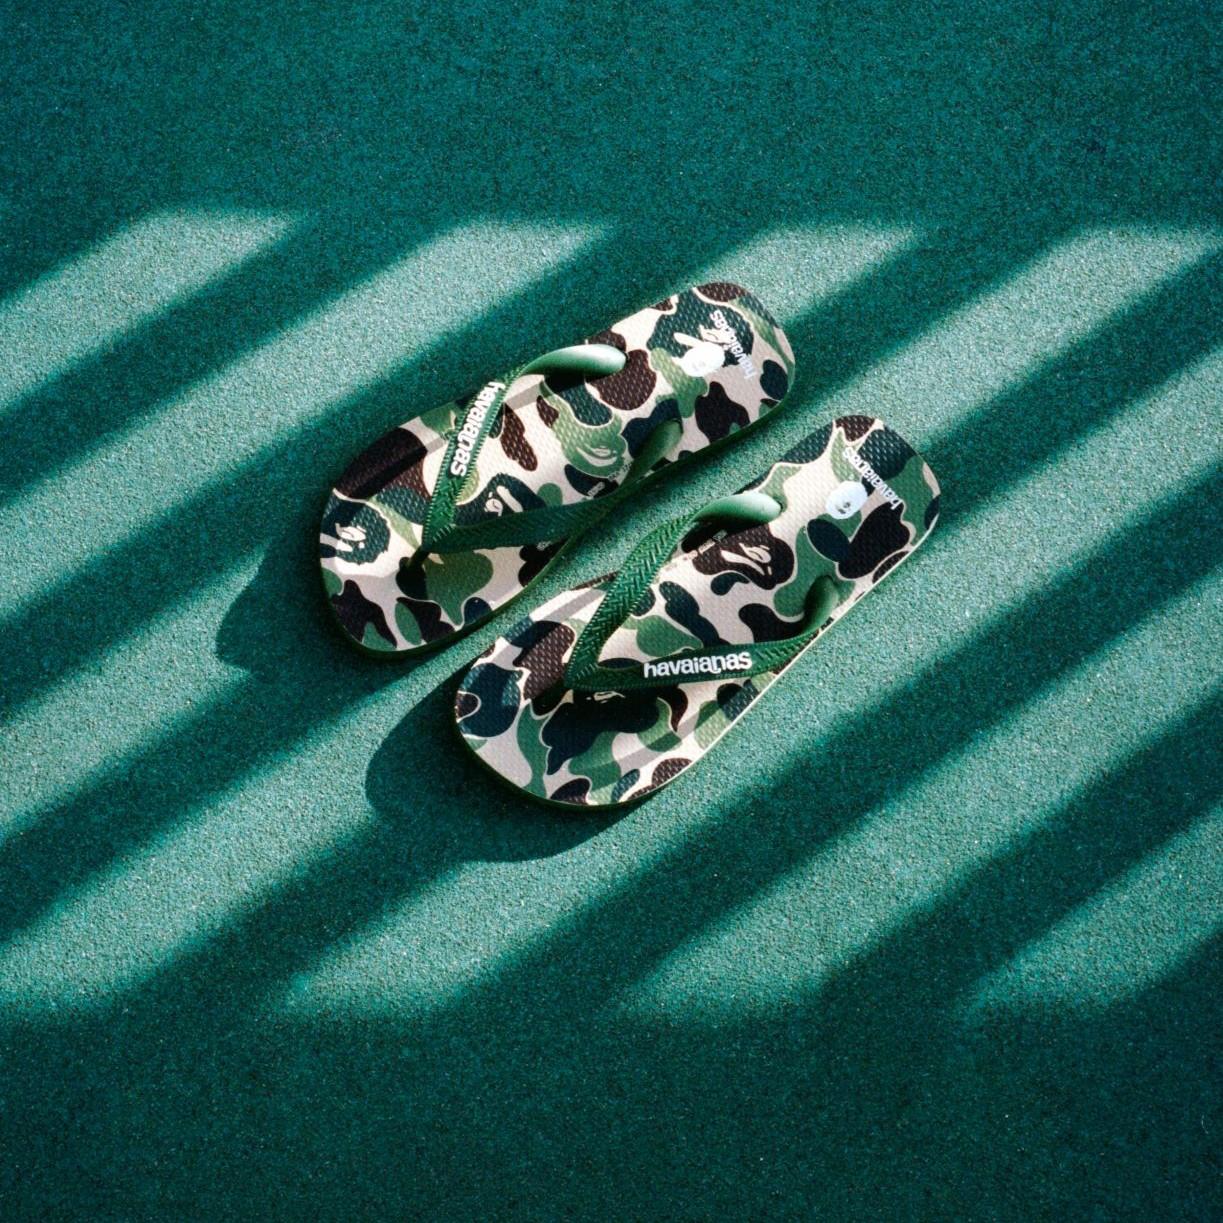 Tampil Ala Streetwear Jepang Dengan Havaianas X A BATHING APE